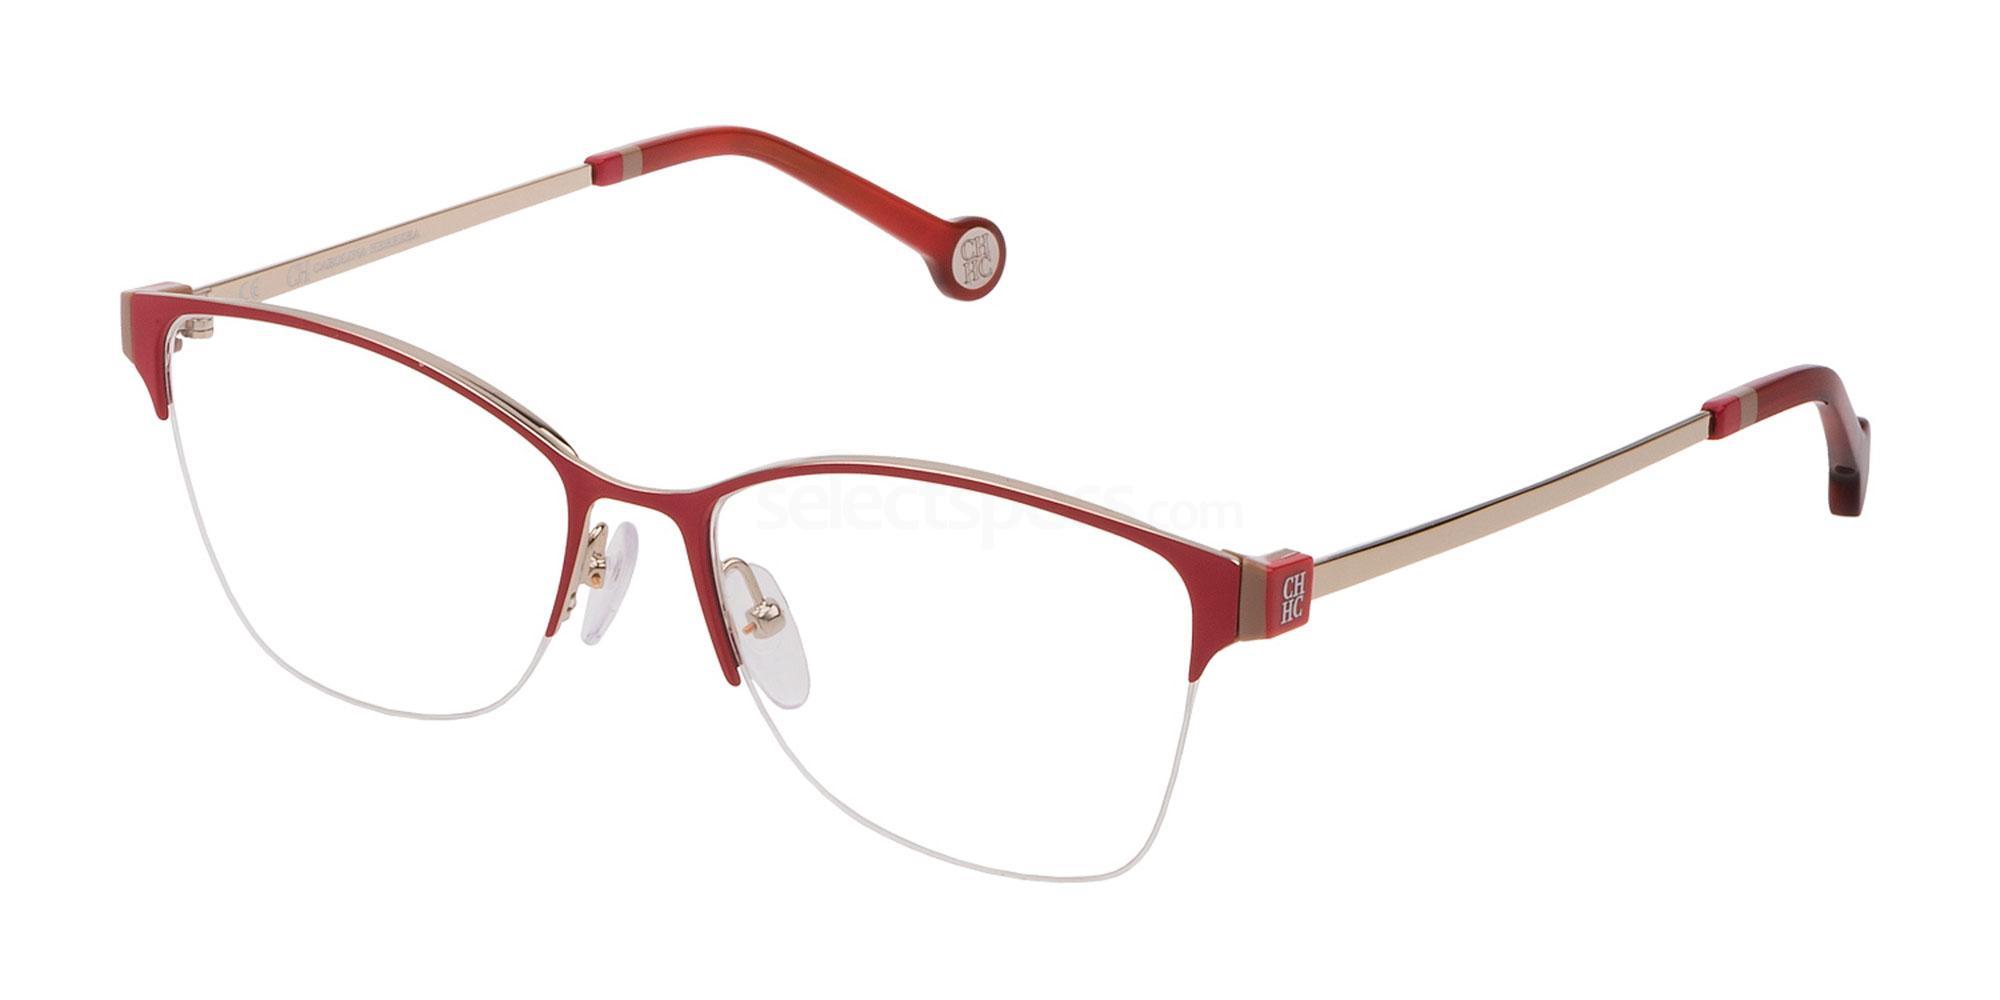 0178 VHE137 Glasses, CH Carolina Herrera